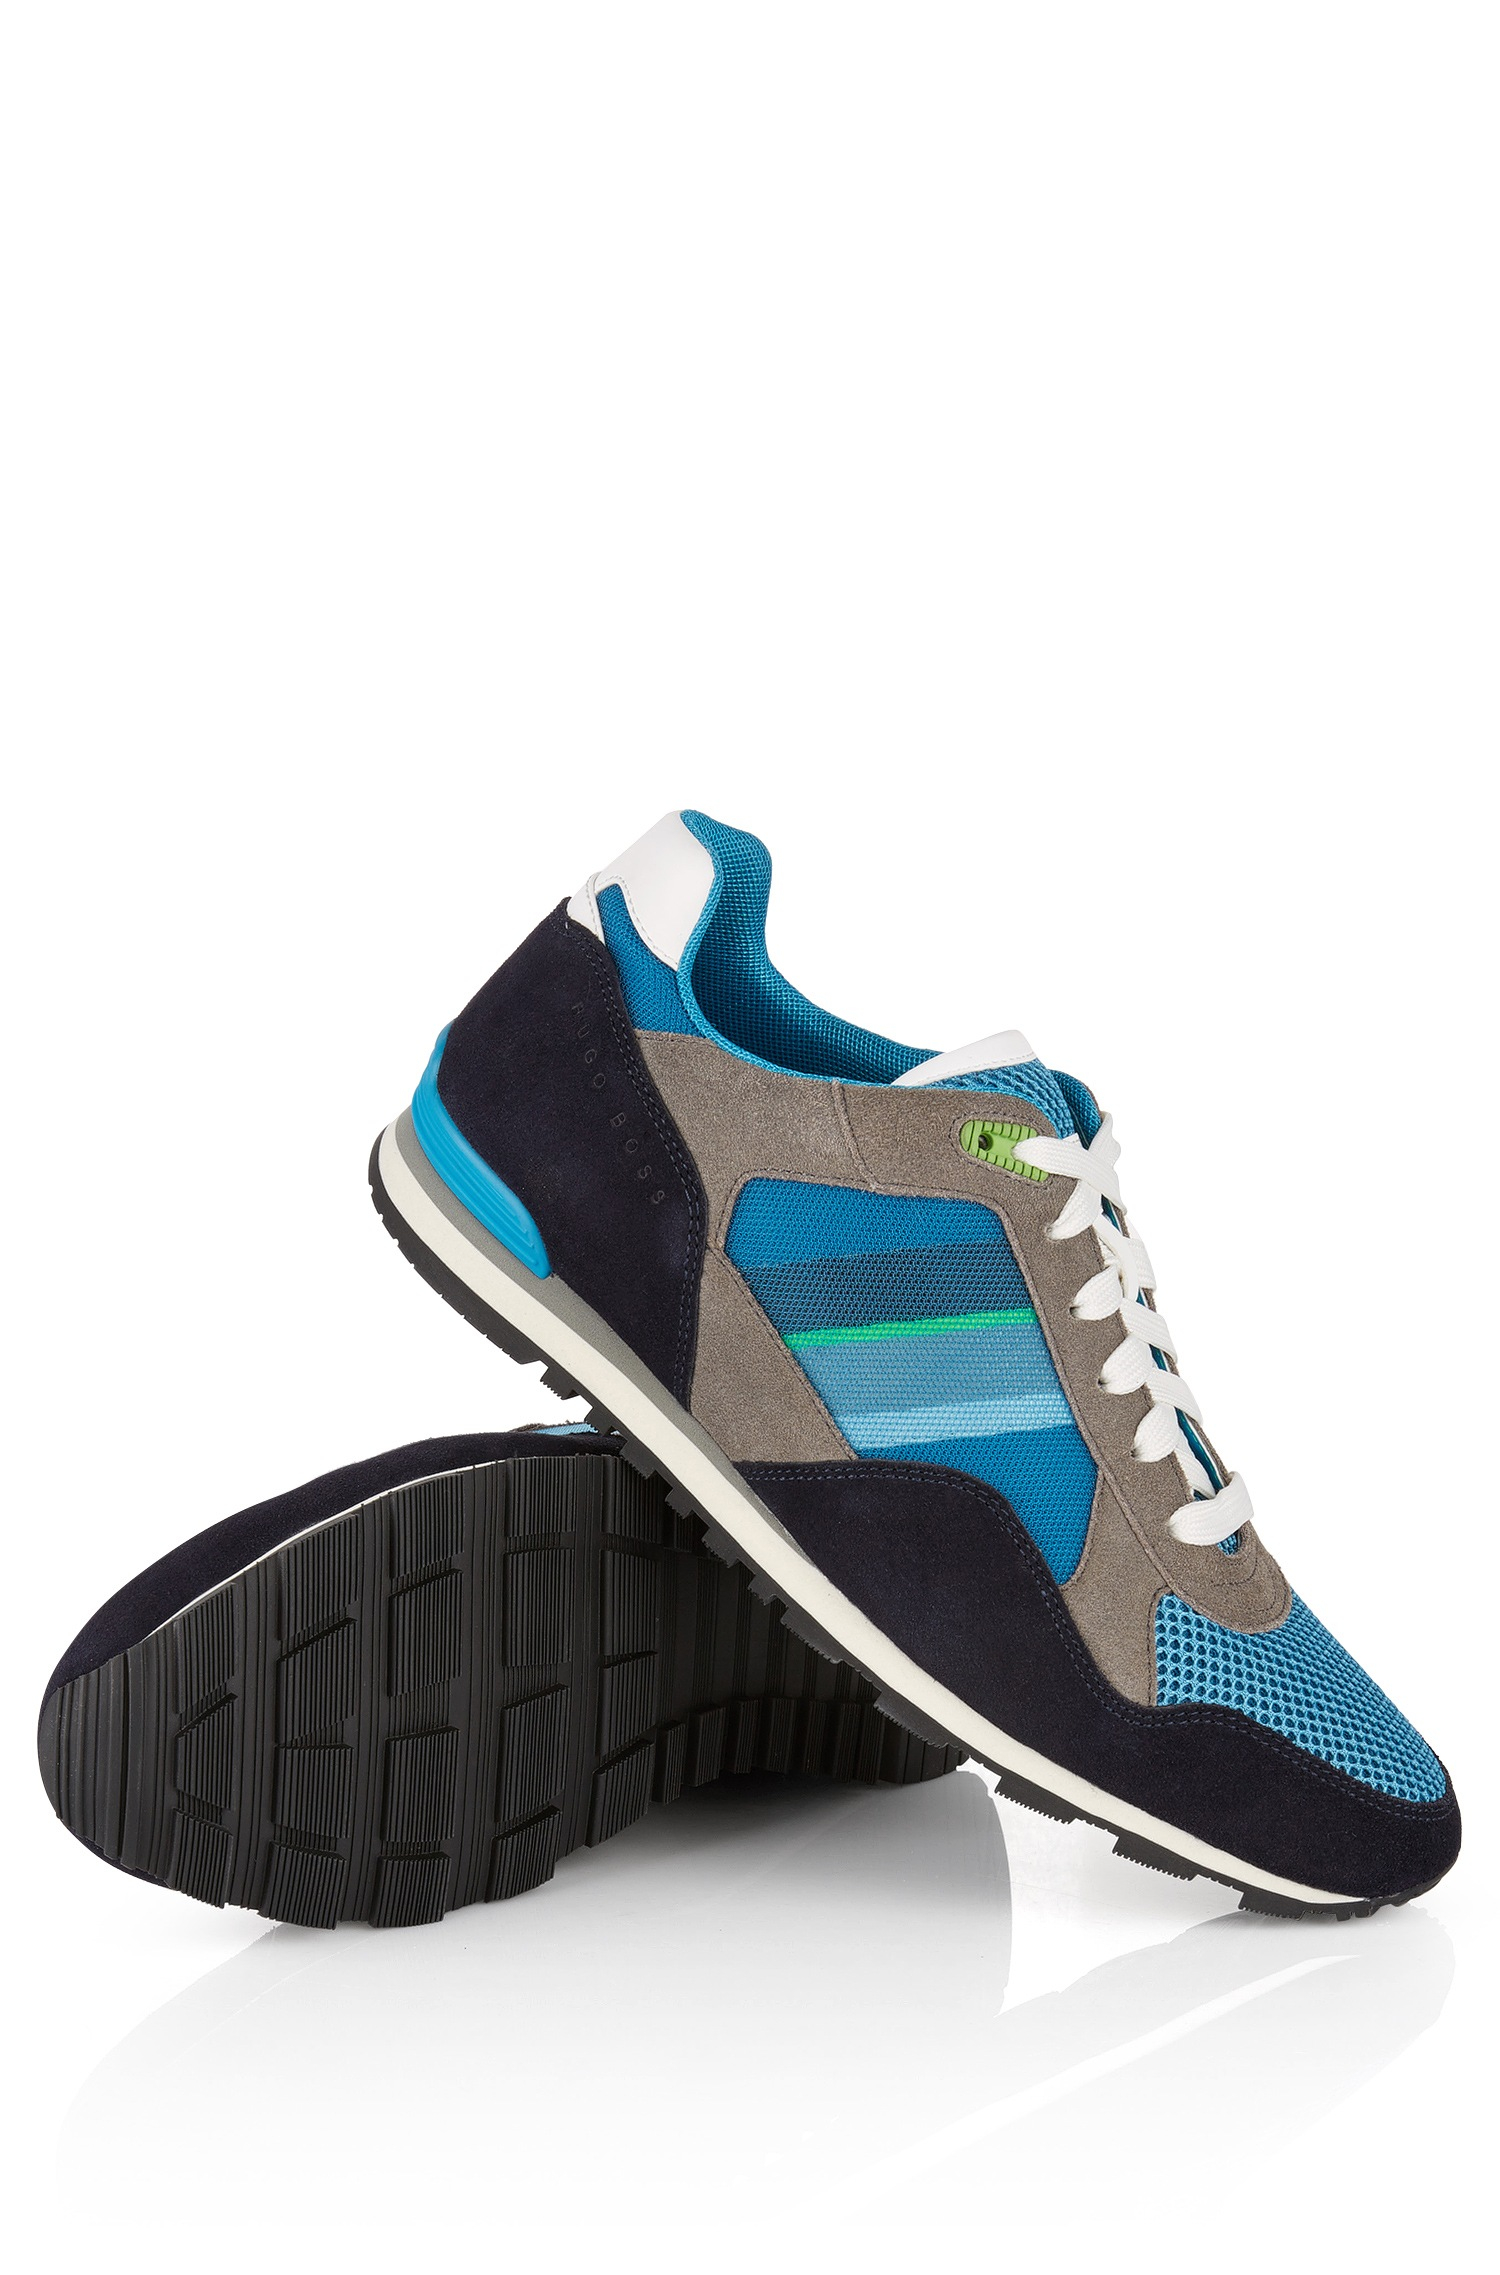 boss green suede sneakers 39 runcool 39 in blue for men open blue lyst. Black Bedroom Furniture Sets. Home Design Ideas